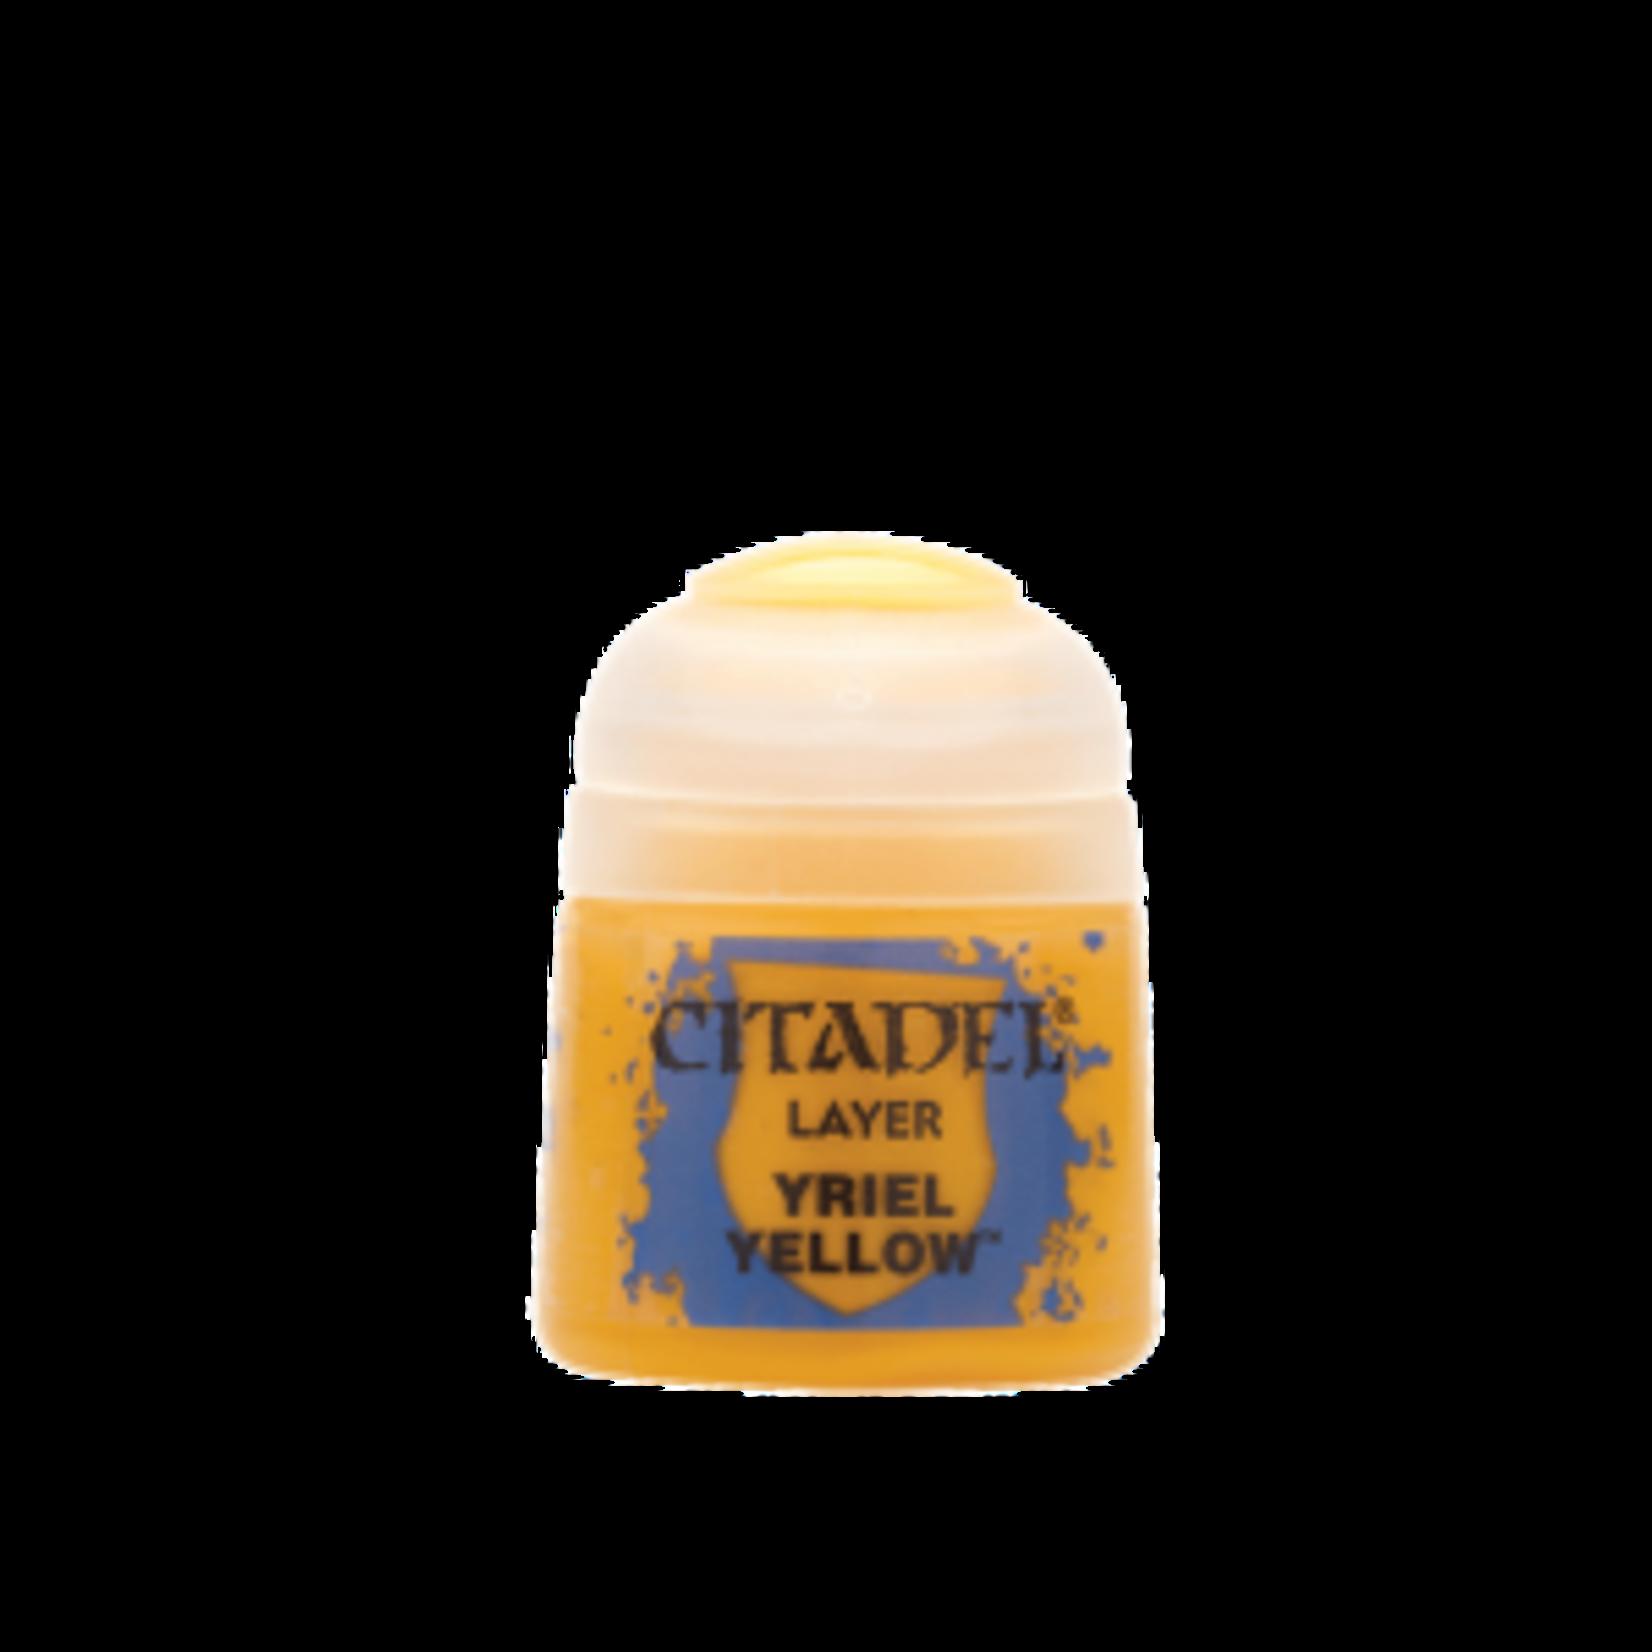 Citadel Layer Yriel Yellow